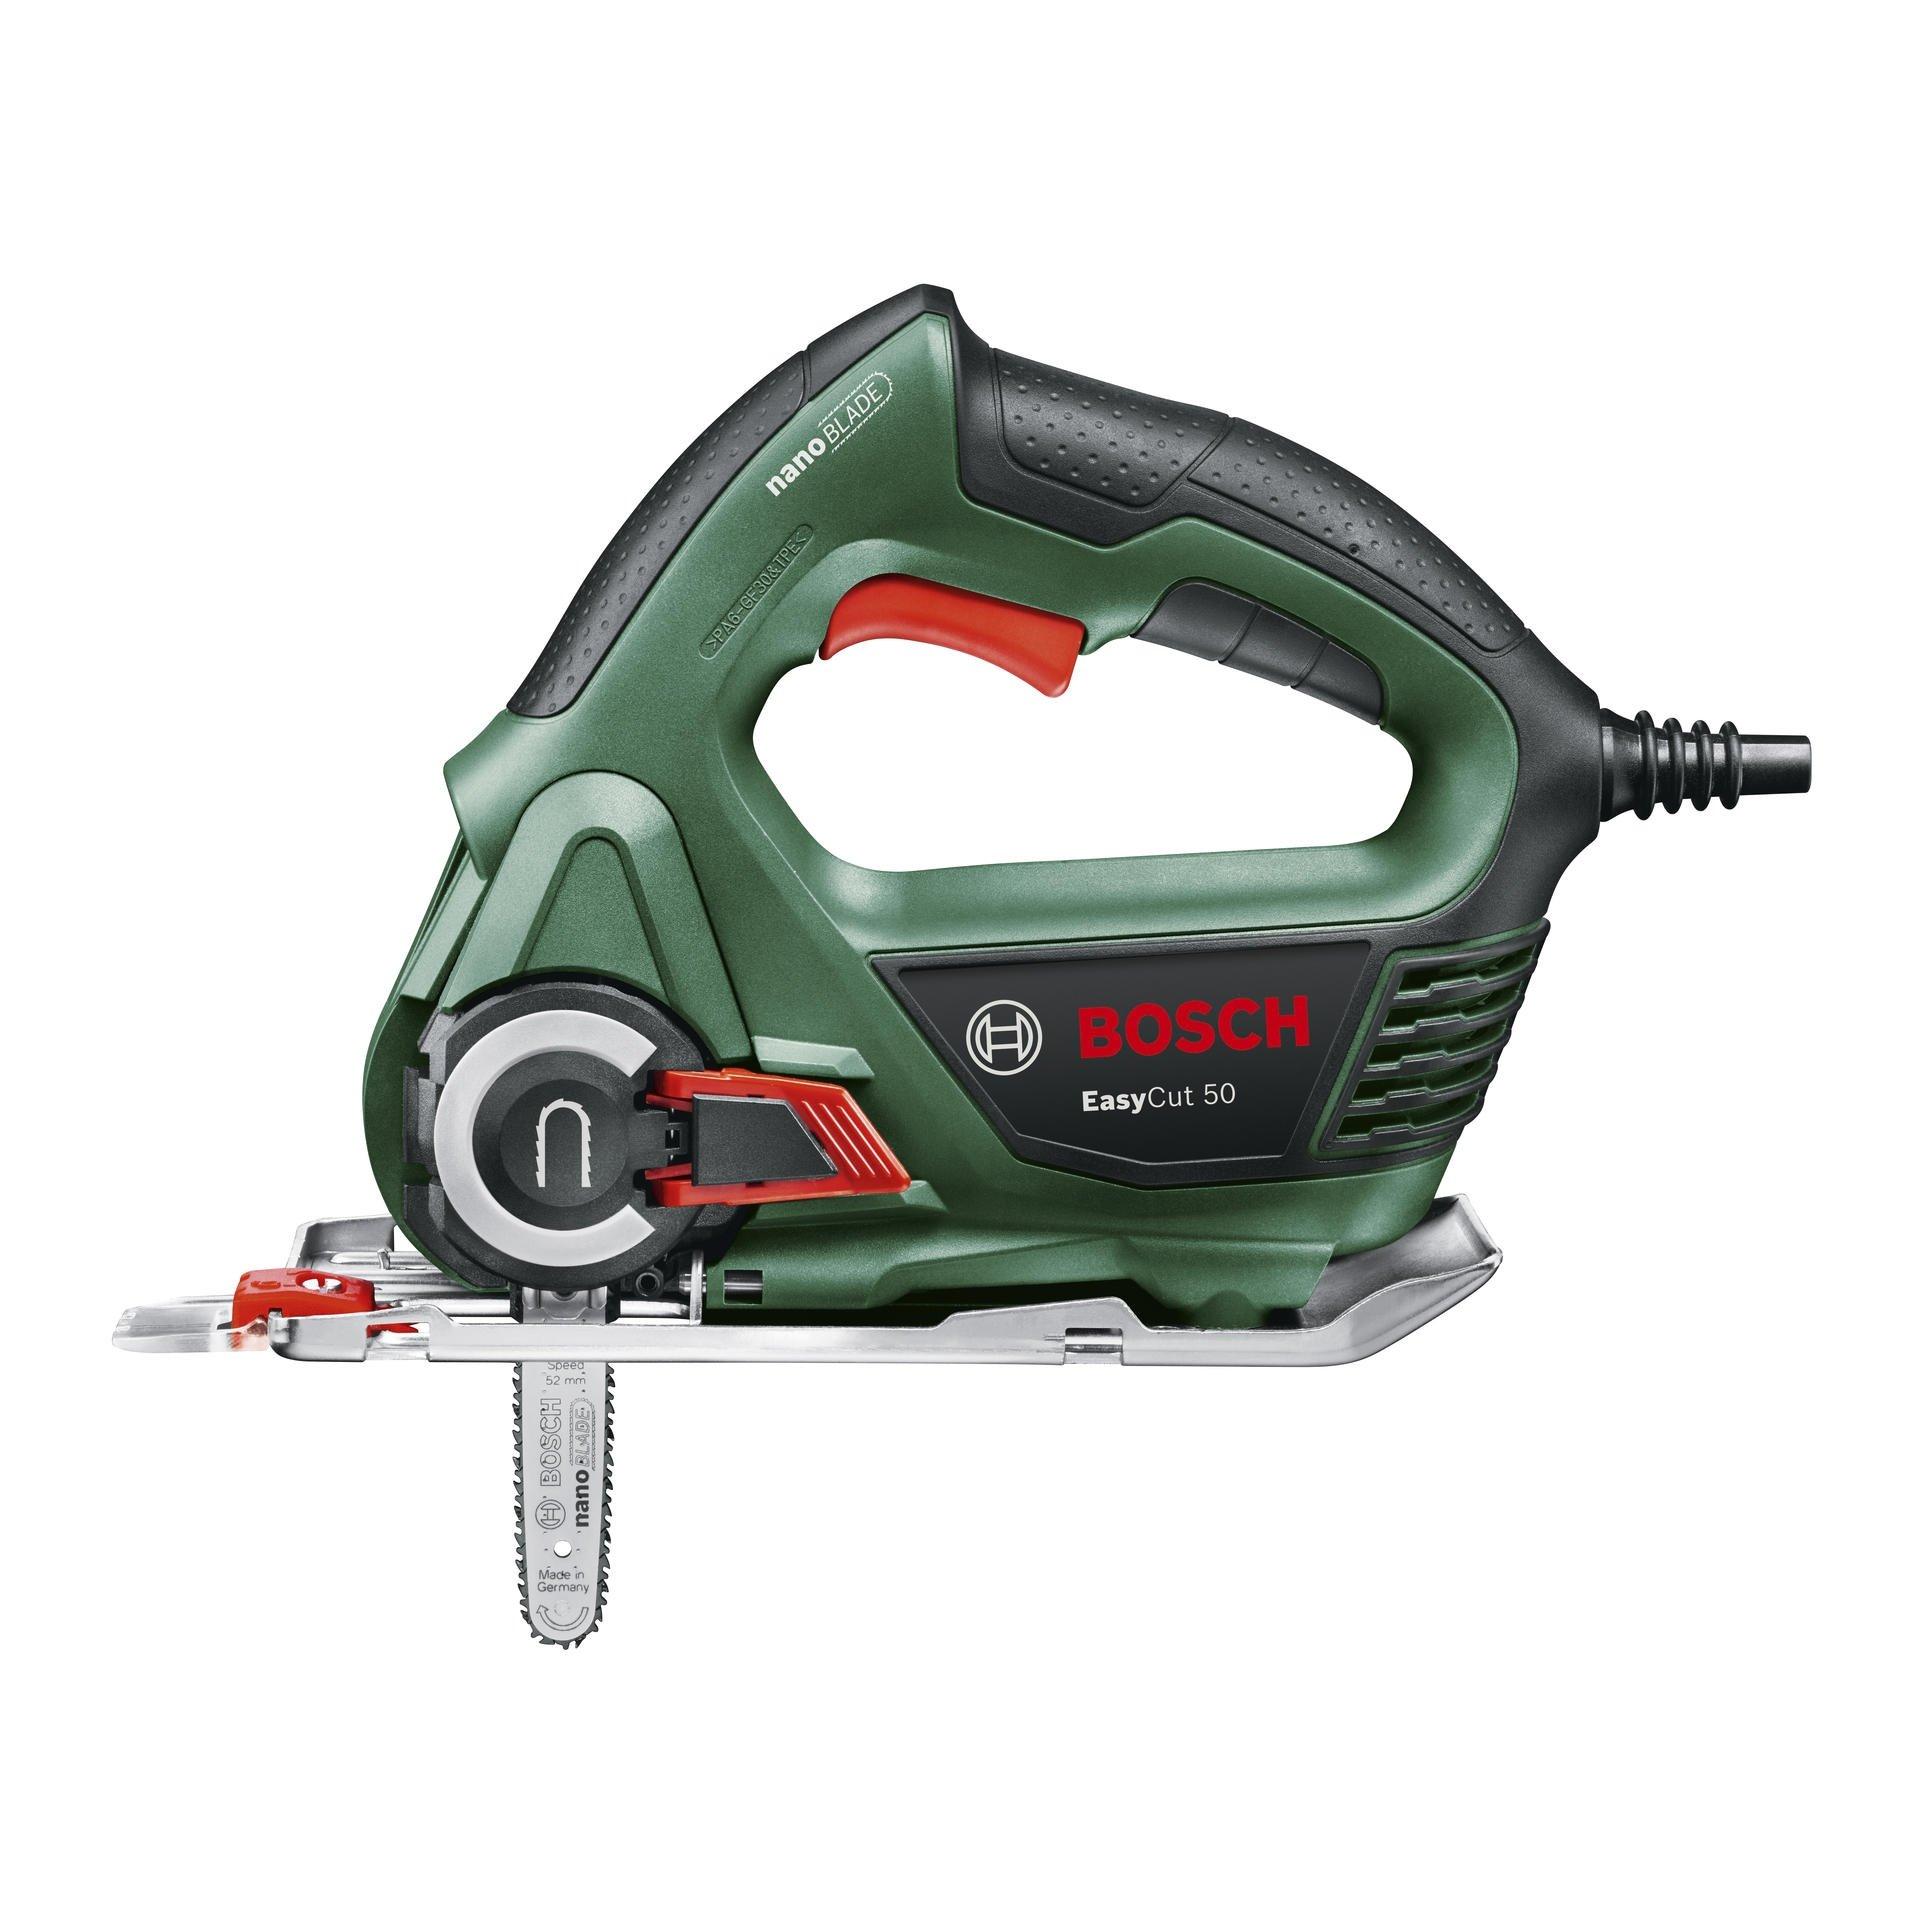 bosch easycut 50 (06033c8020) | tools, repair supplies | plumbing